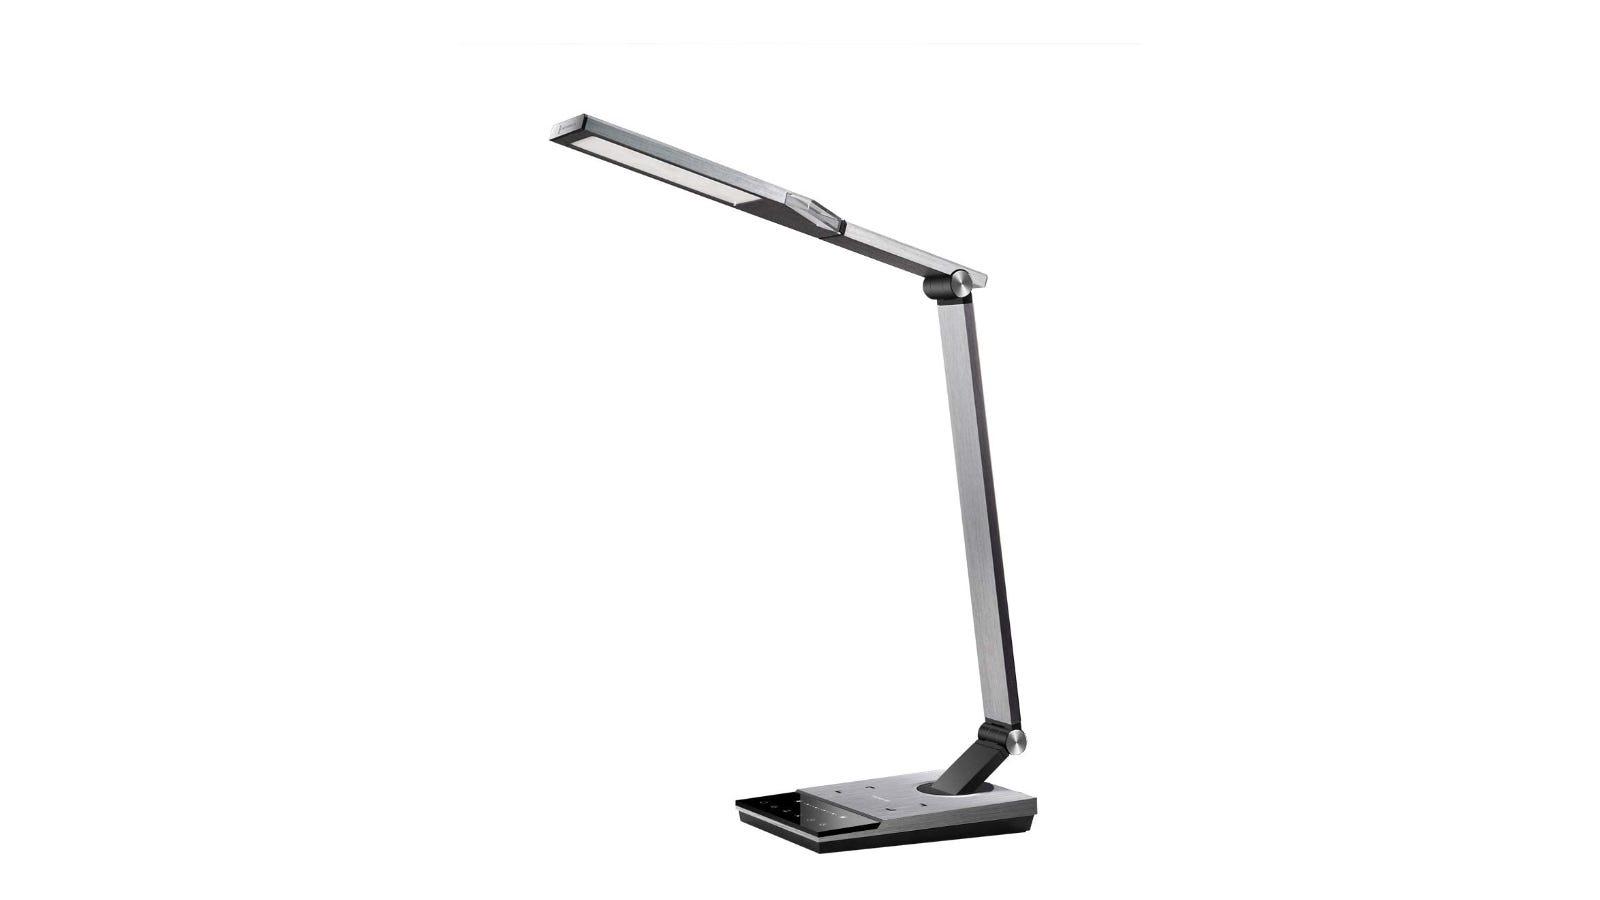 TaoTronics TT-DL050 desk lamp